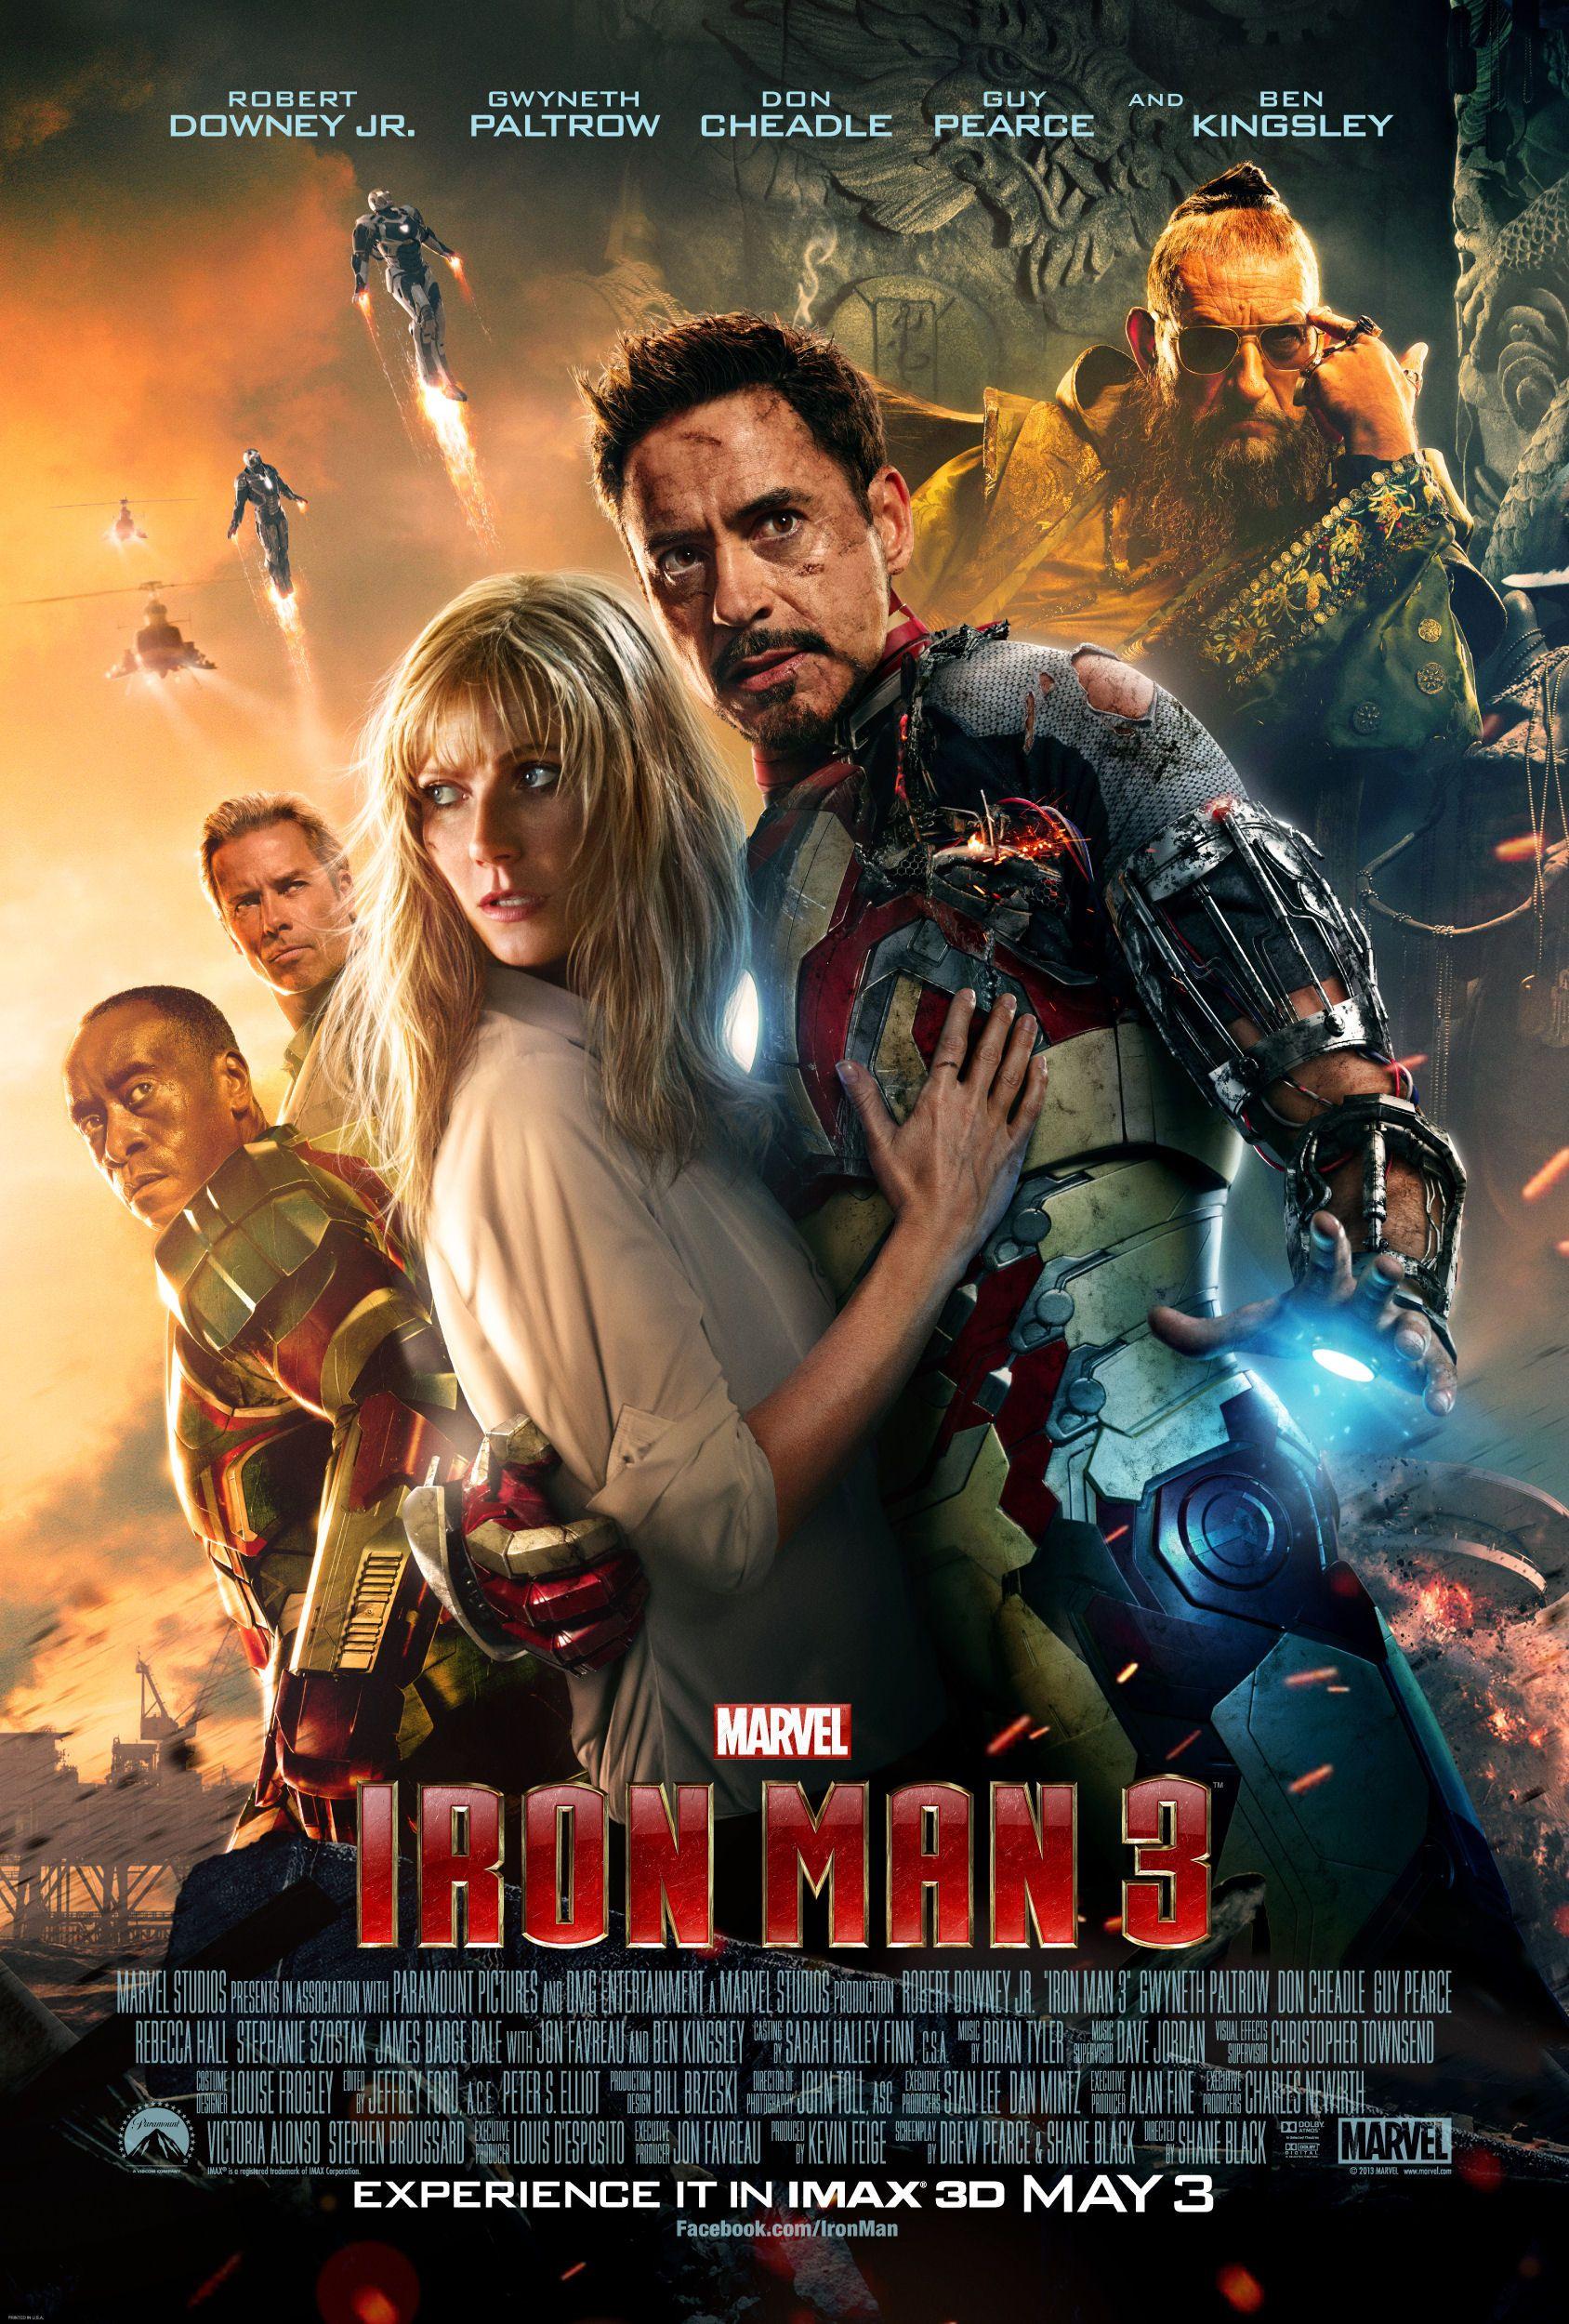 iron man 3 hd movie poster - - www.hdmovieposters | movie